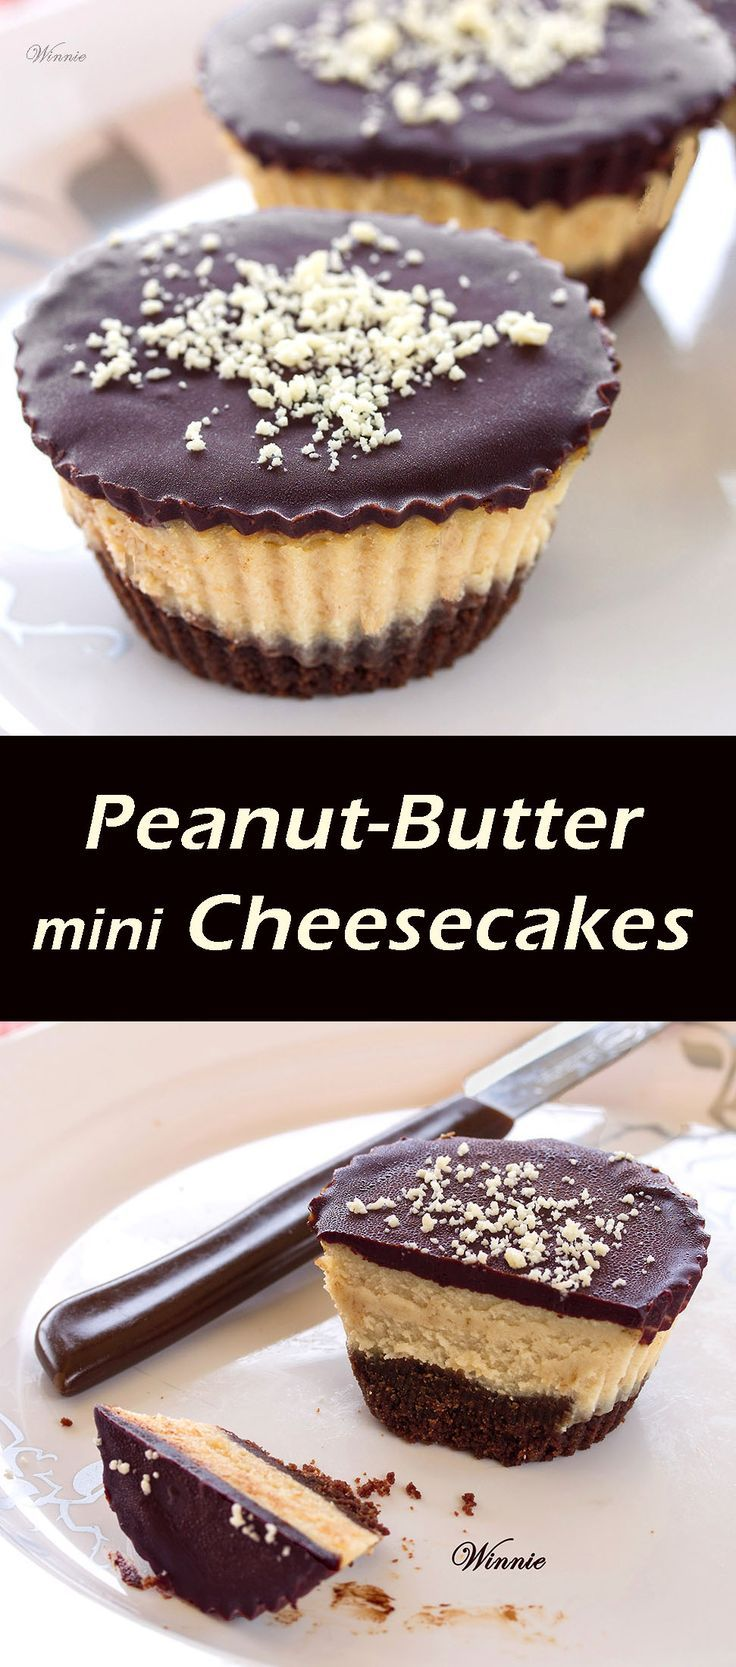 1000+ images about Food/Yummy/Imafatty on Pinterest | Pennsylvania ...